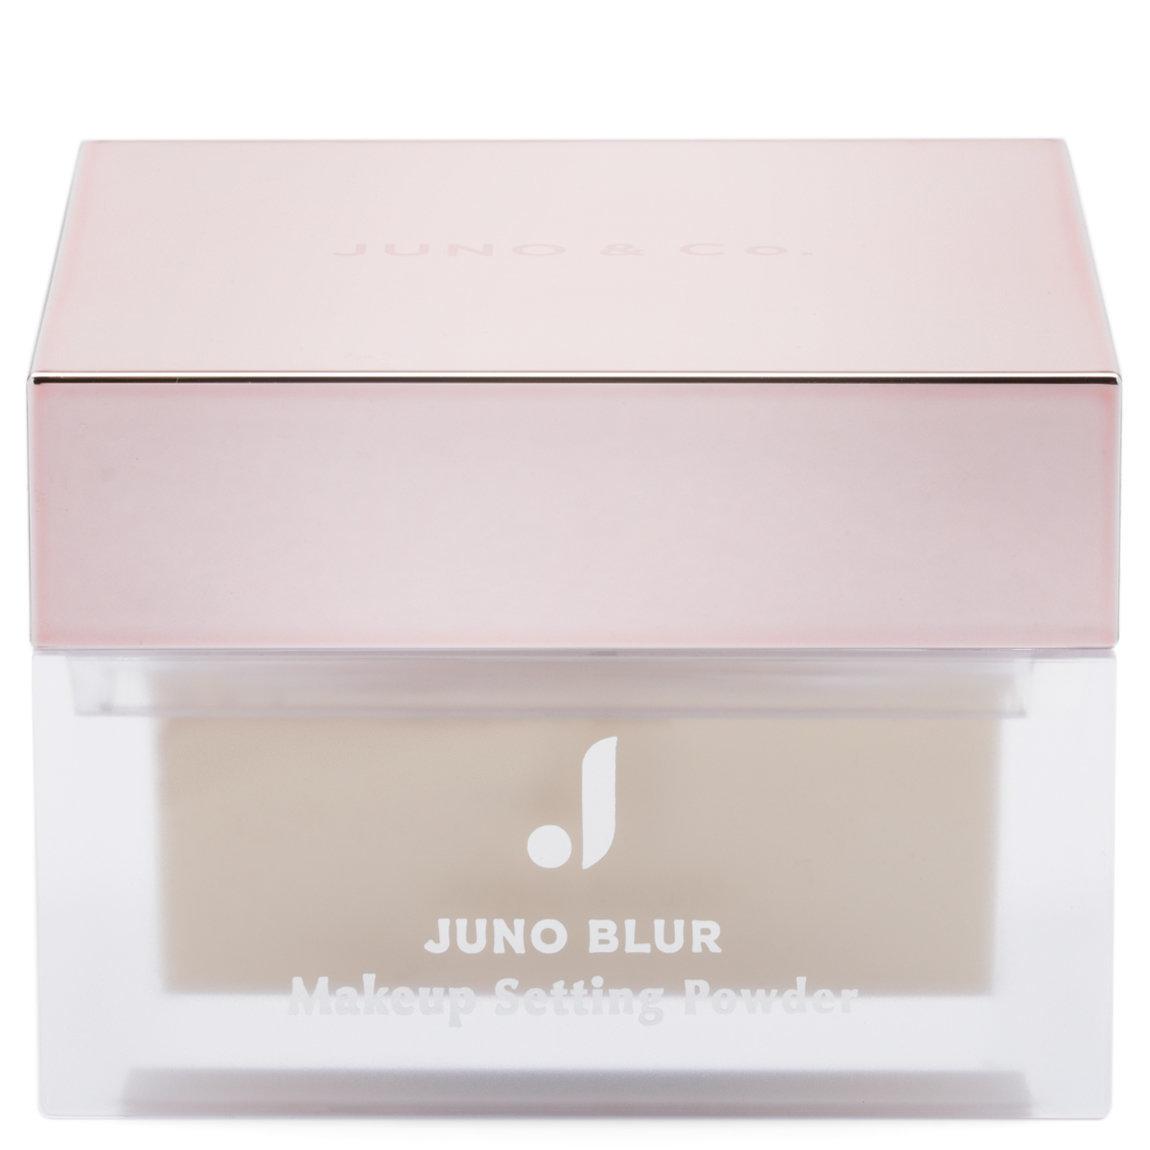 JUNO & Co. Juno Blur Makeup Setting Powder - Brightening product swatch.